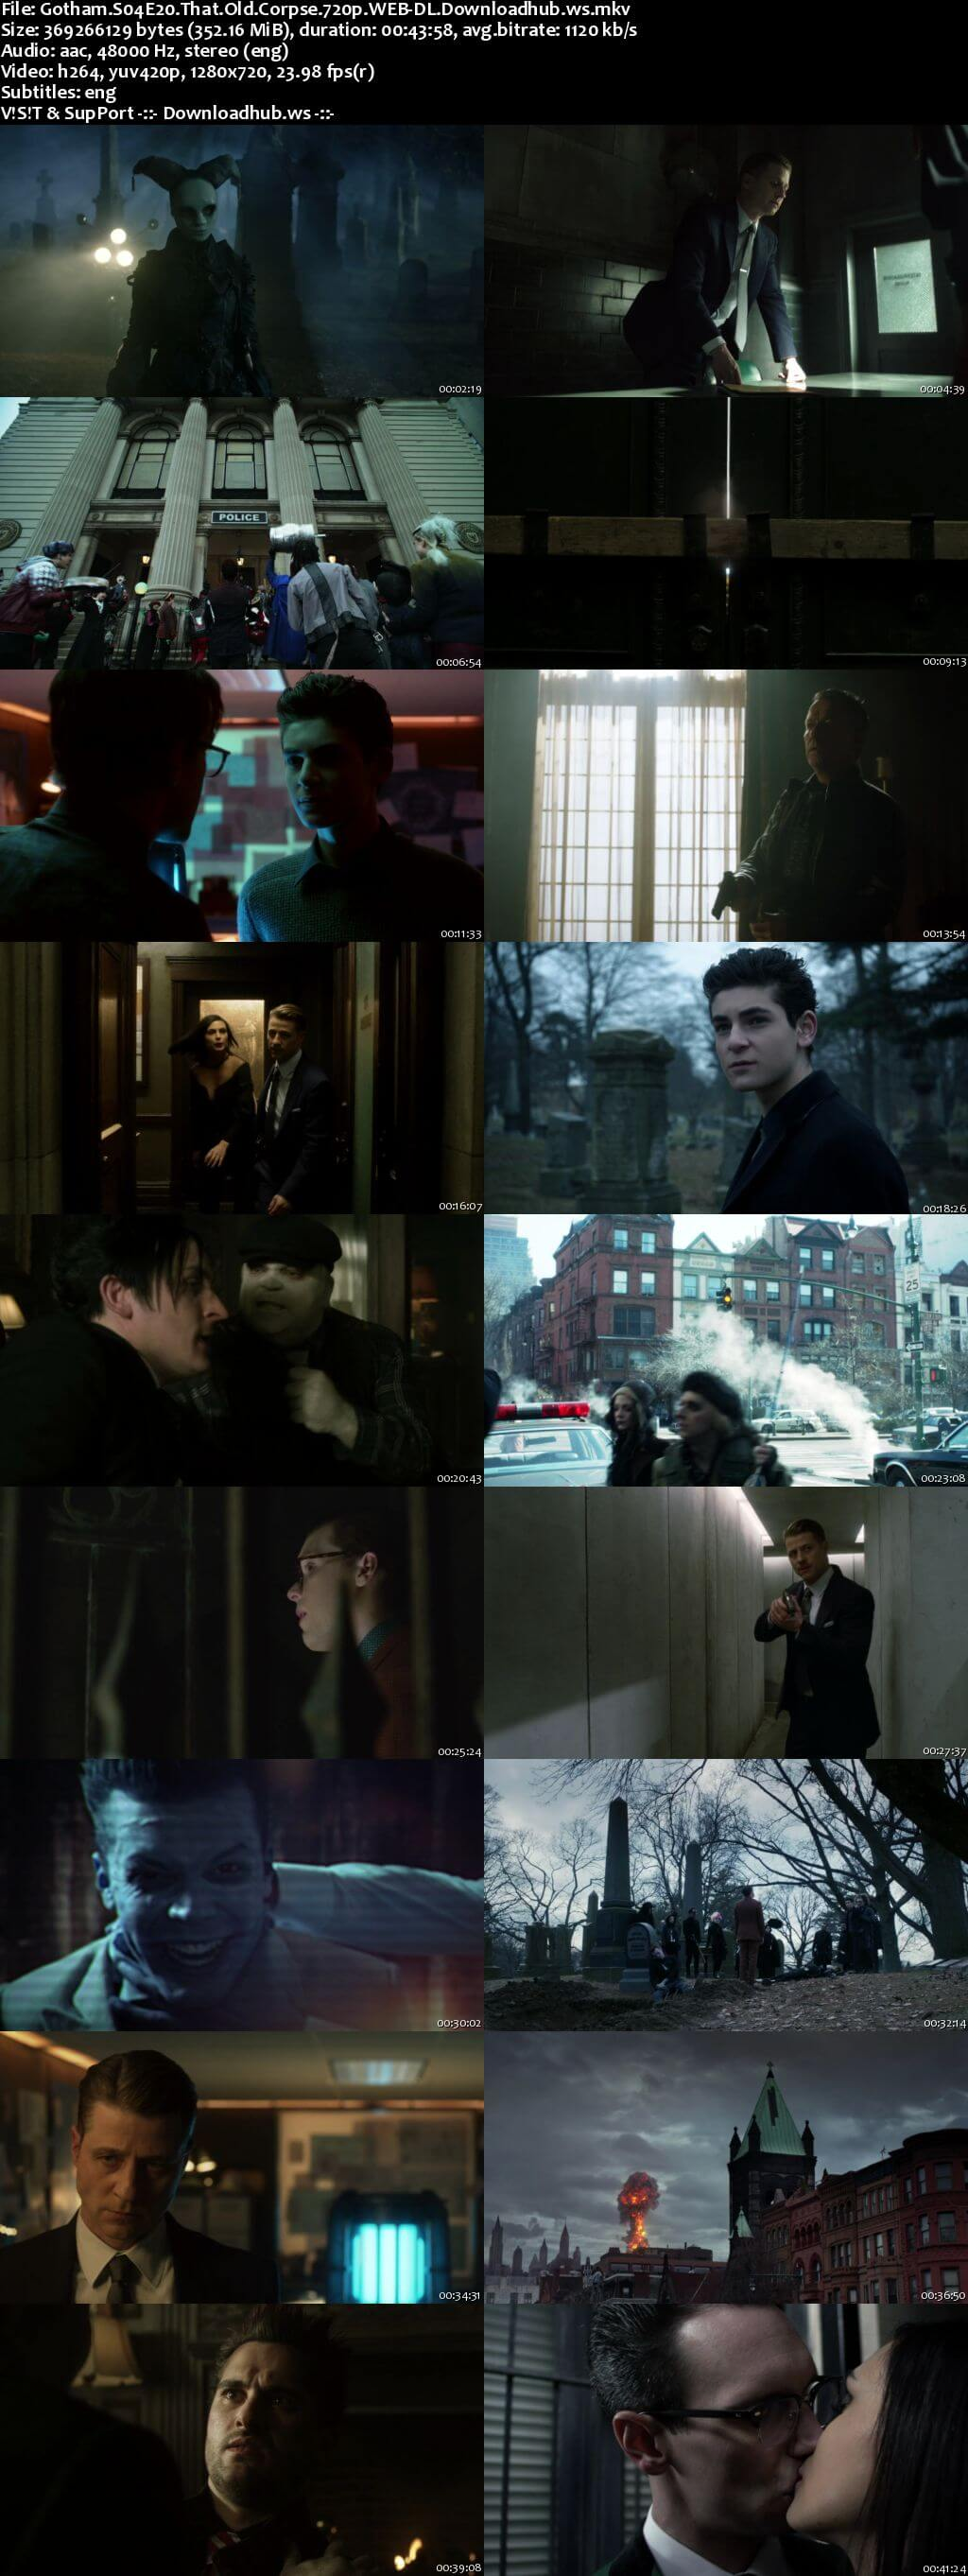 Gotham S04E20 350MB Web-DL 720p x264 ESubs